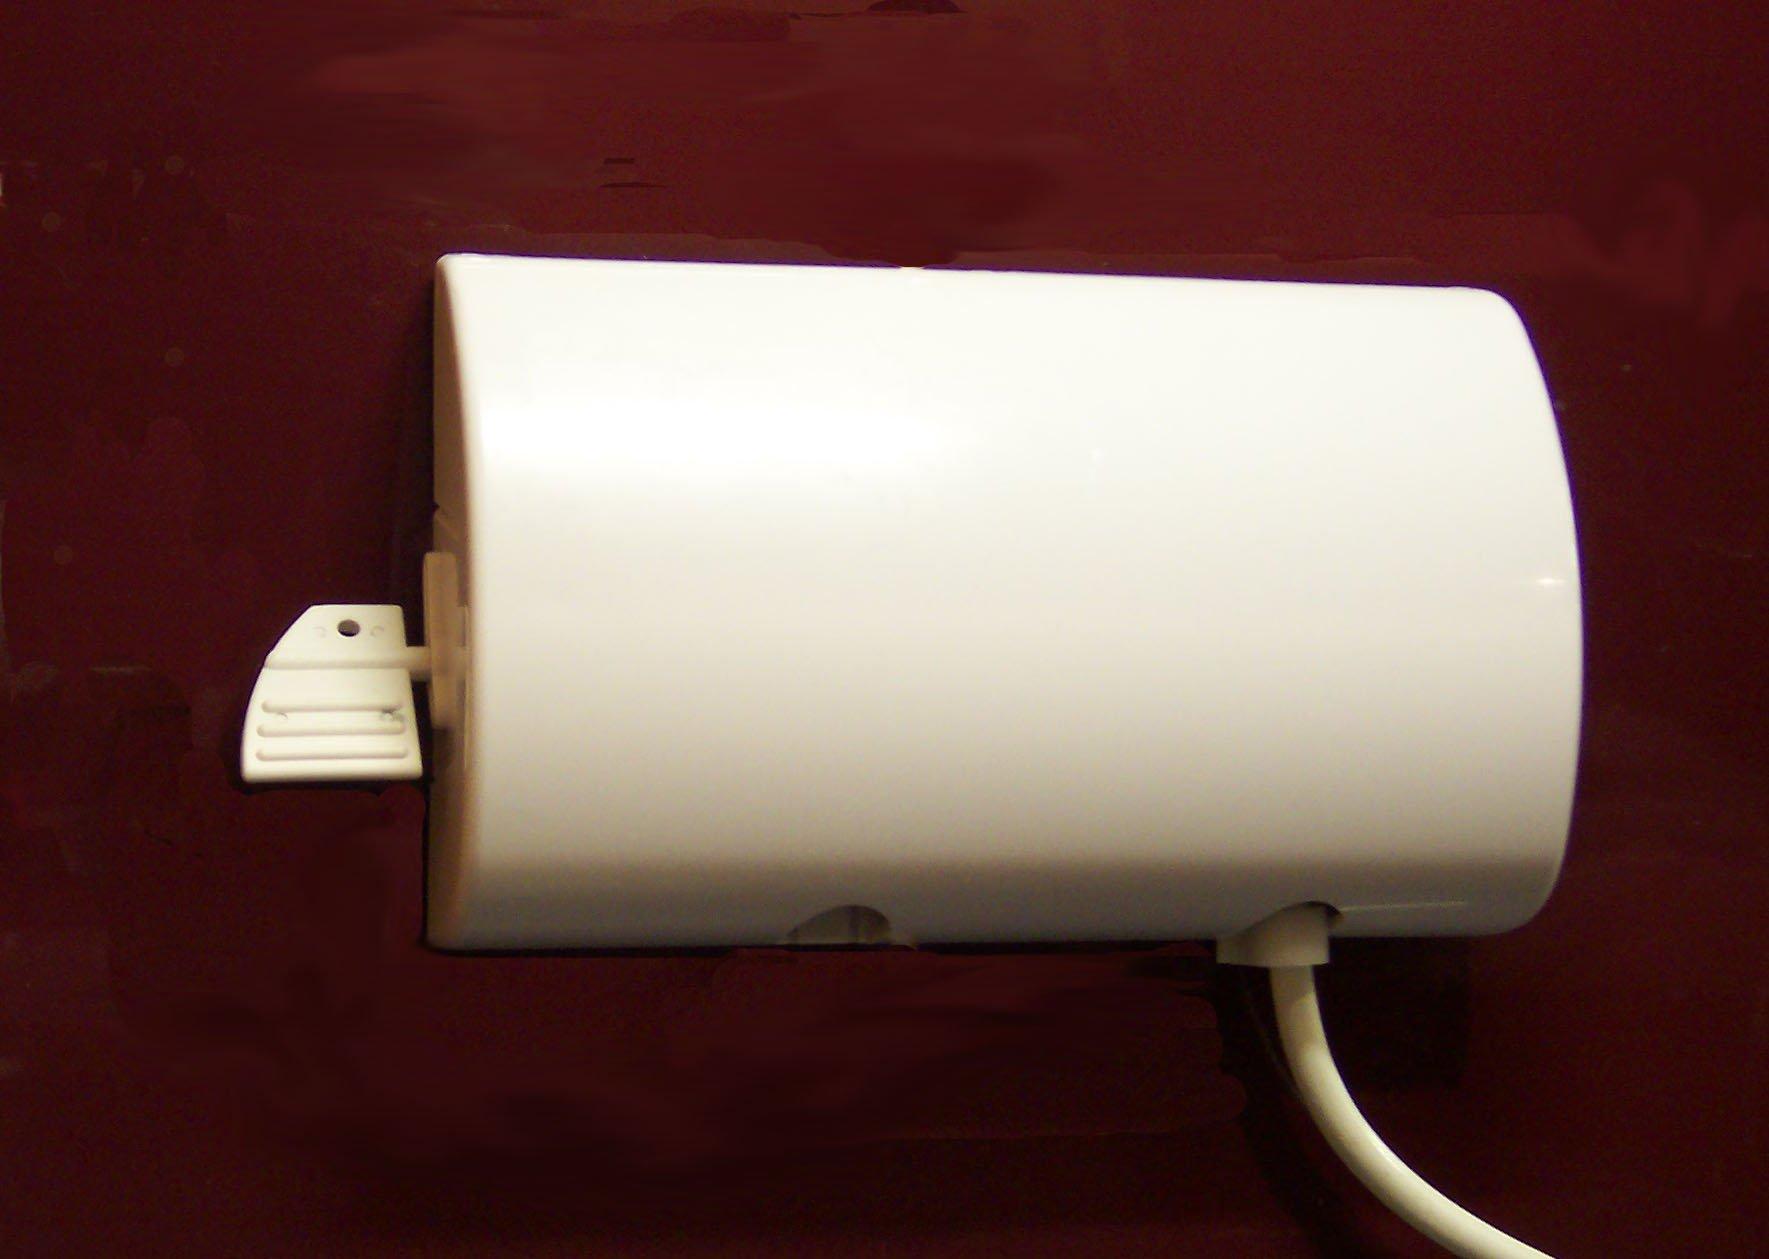 TONGXU Electrical Plug Socket Protector White Double Socket Protector Electric Plug Cover Baby Child Safety Box